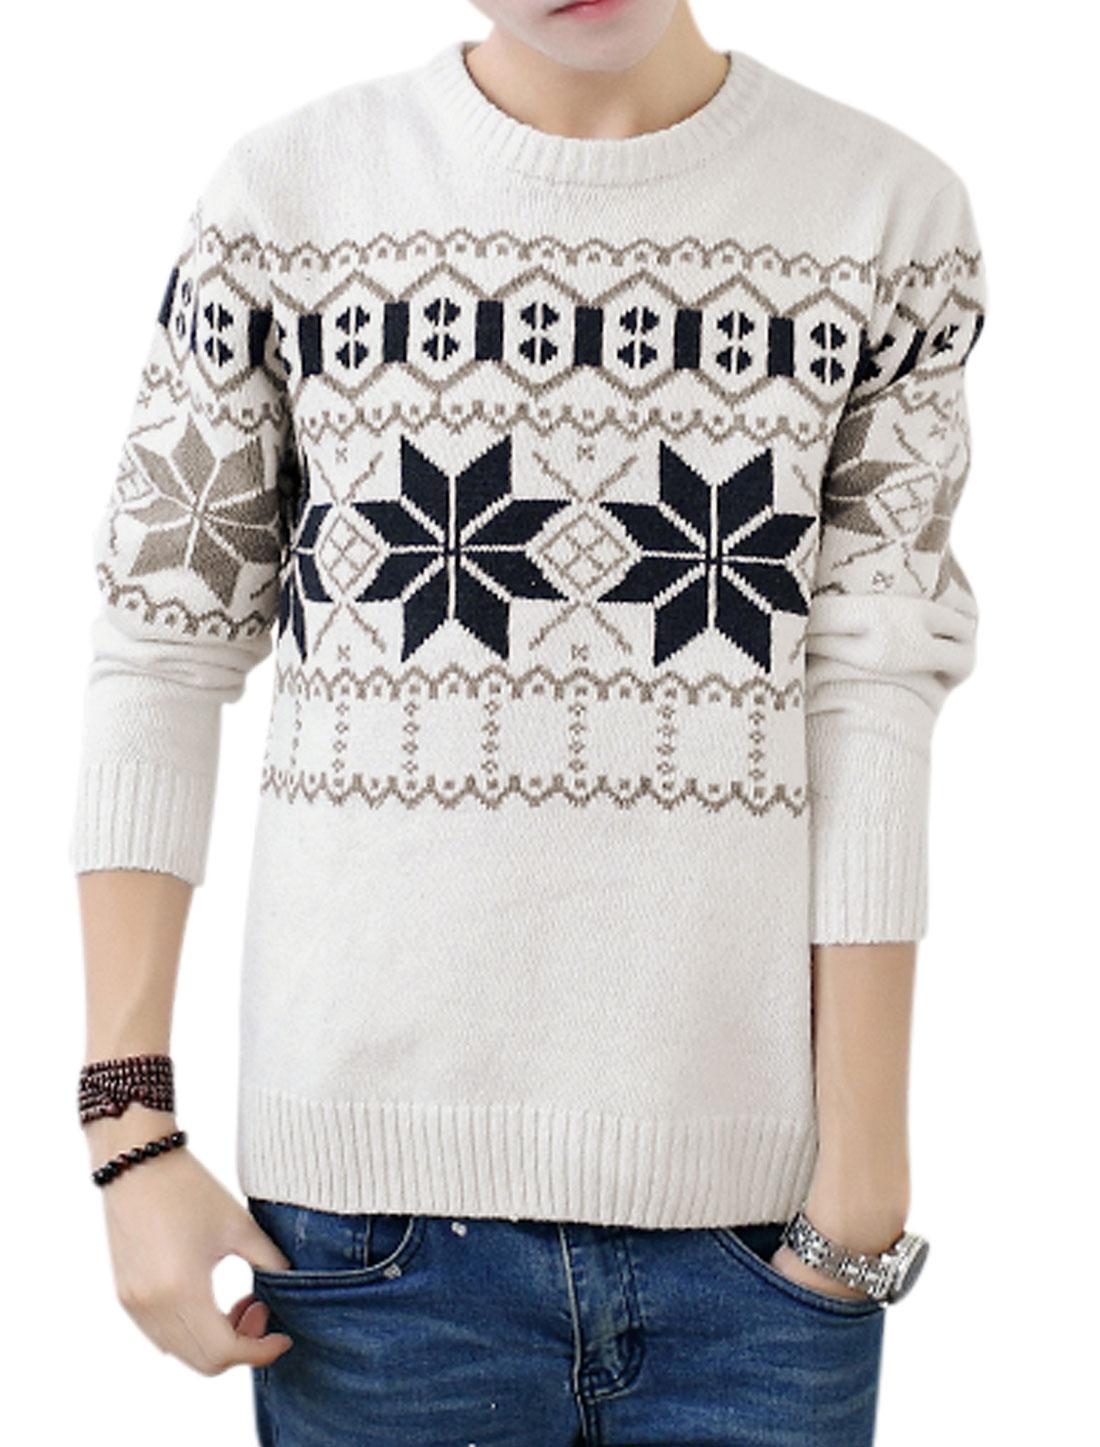 Fashion Design Full Sleeves Crew Neck Off White Sweater for Men S